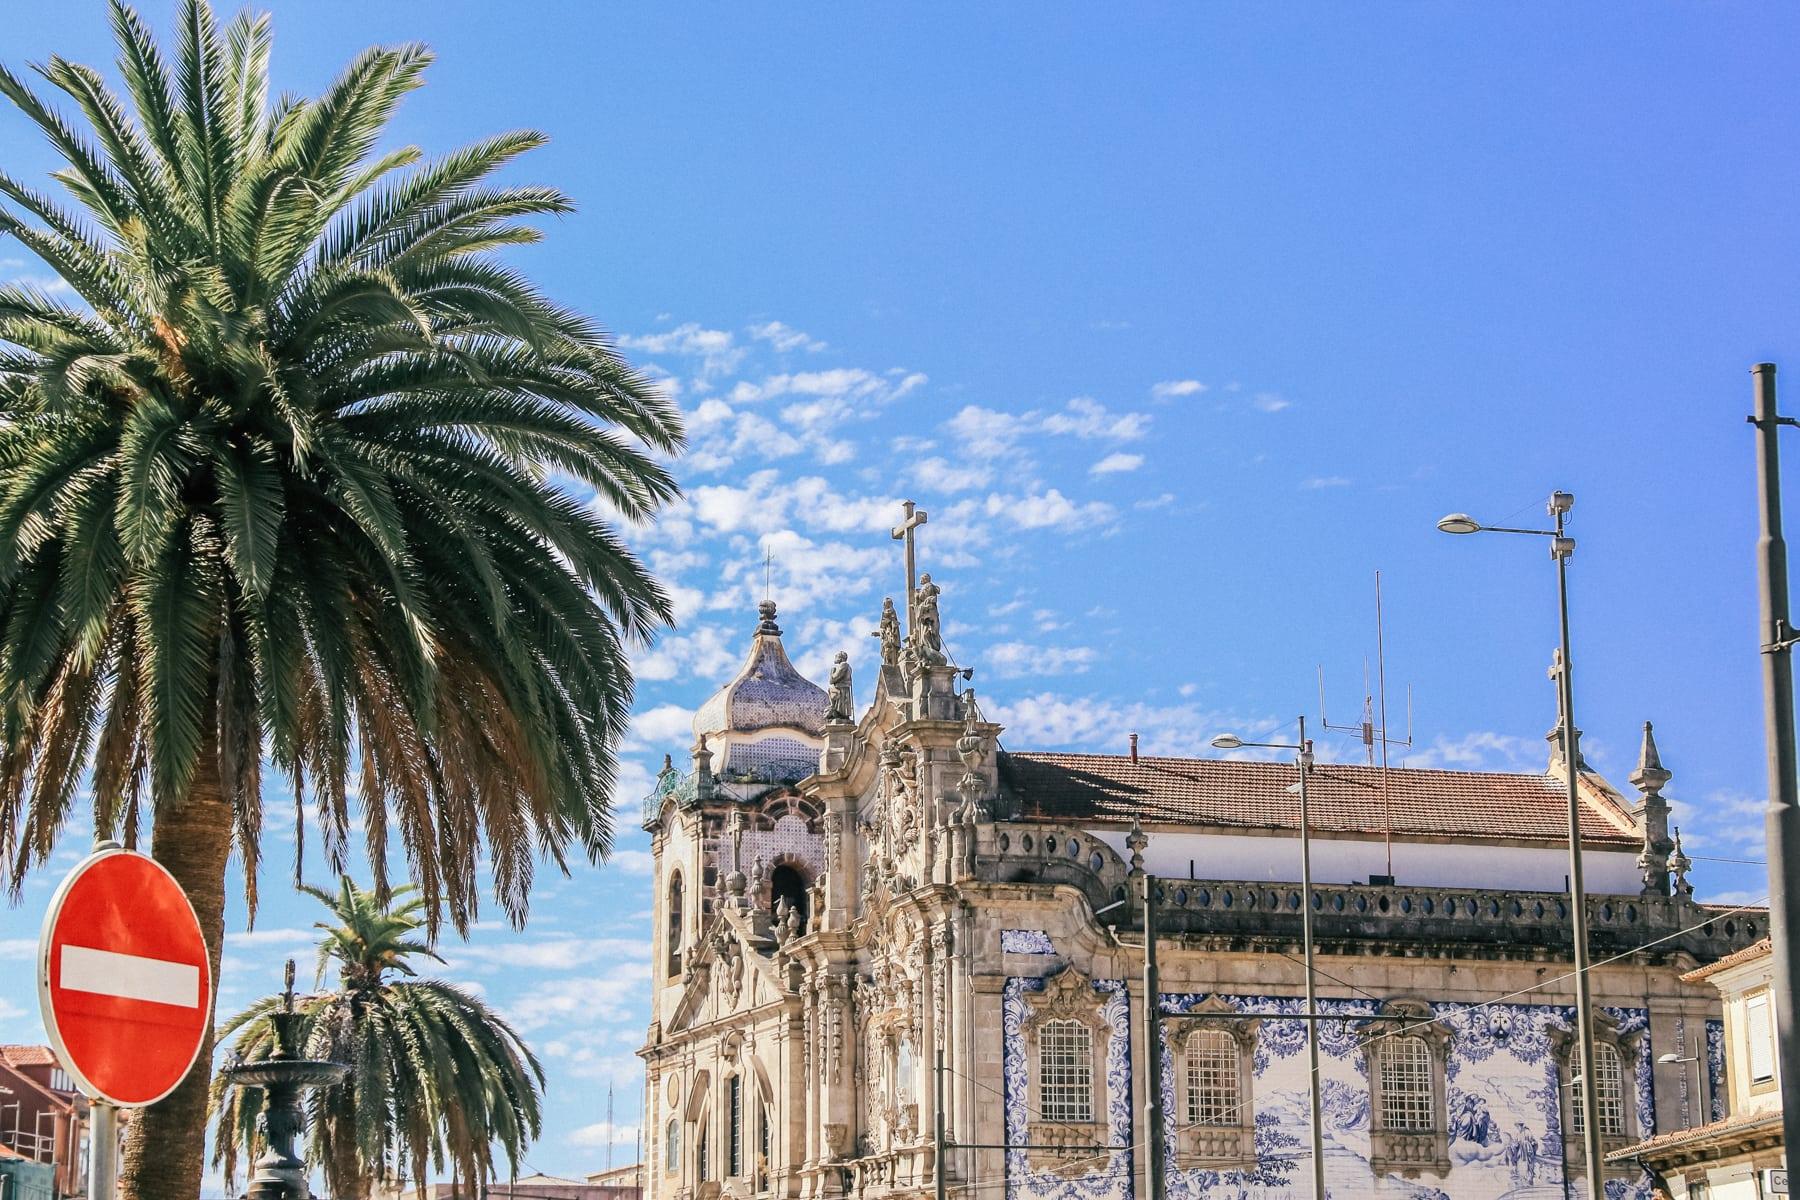 zehn-porto-tipps-fuer-deine-staedtereise-in-portugal-reiseblog-des-belles-choses 63